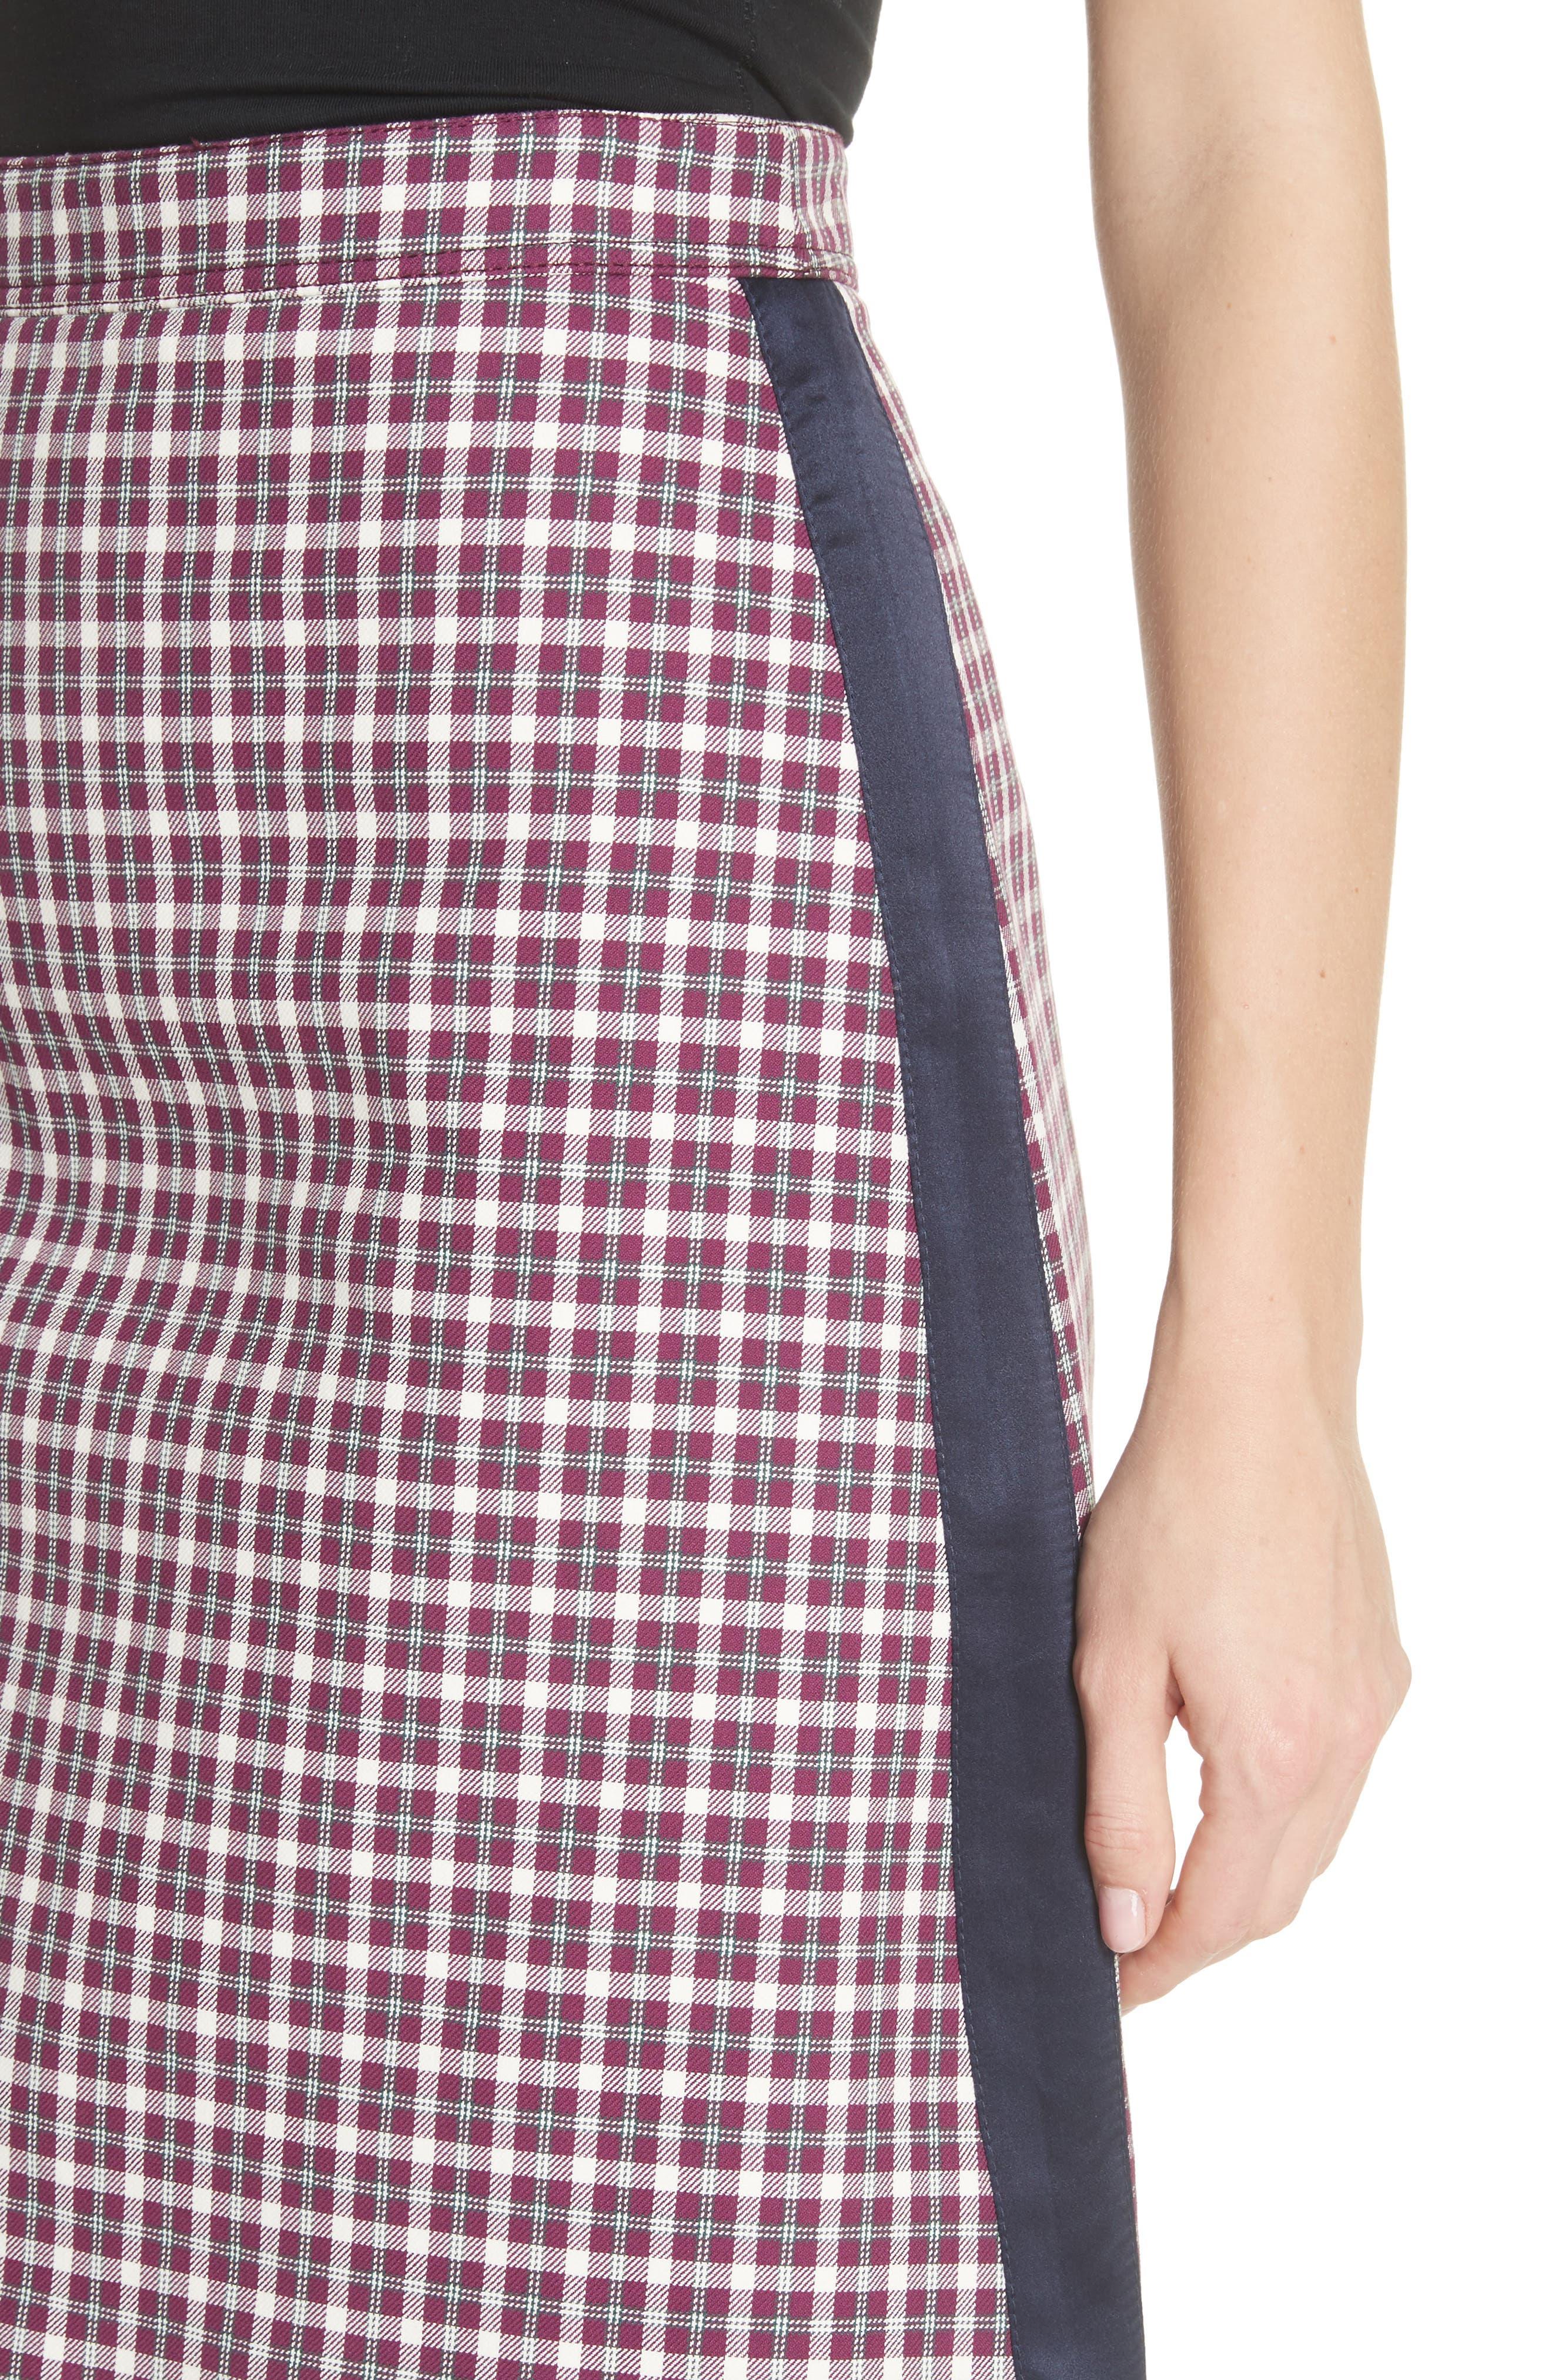 Stanforth Plaid A-Line Skirt,                             Alternate thumbnail 4, color,                             931